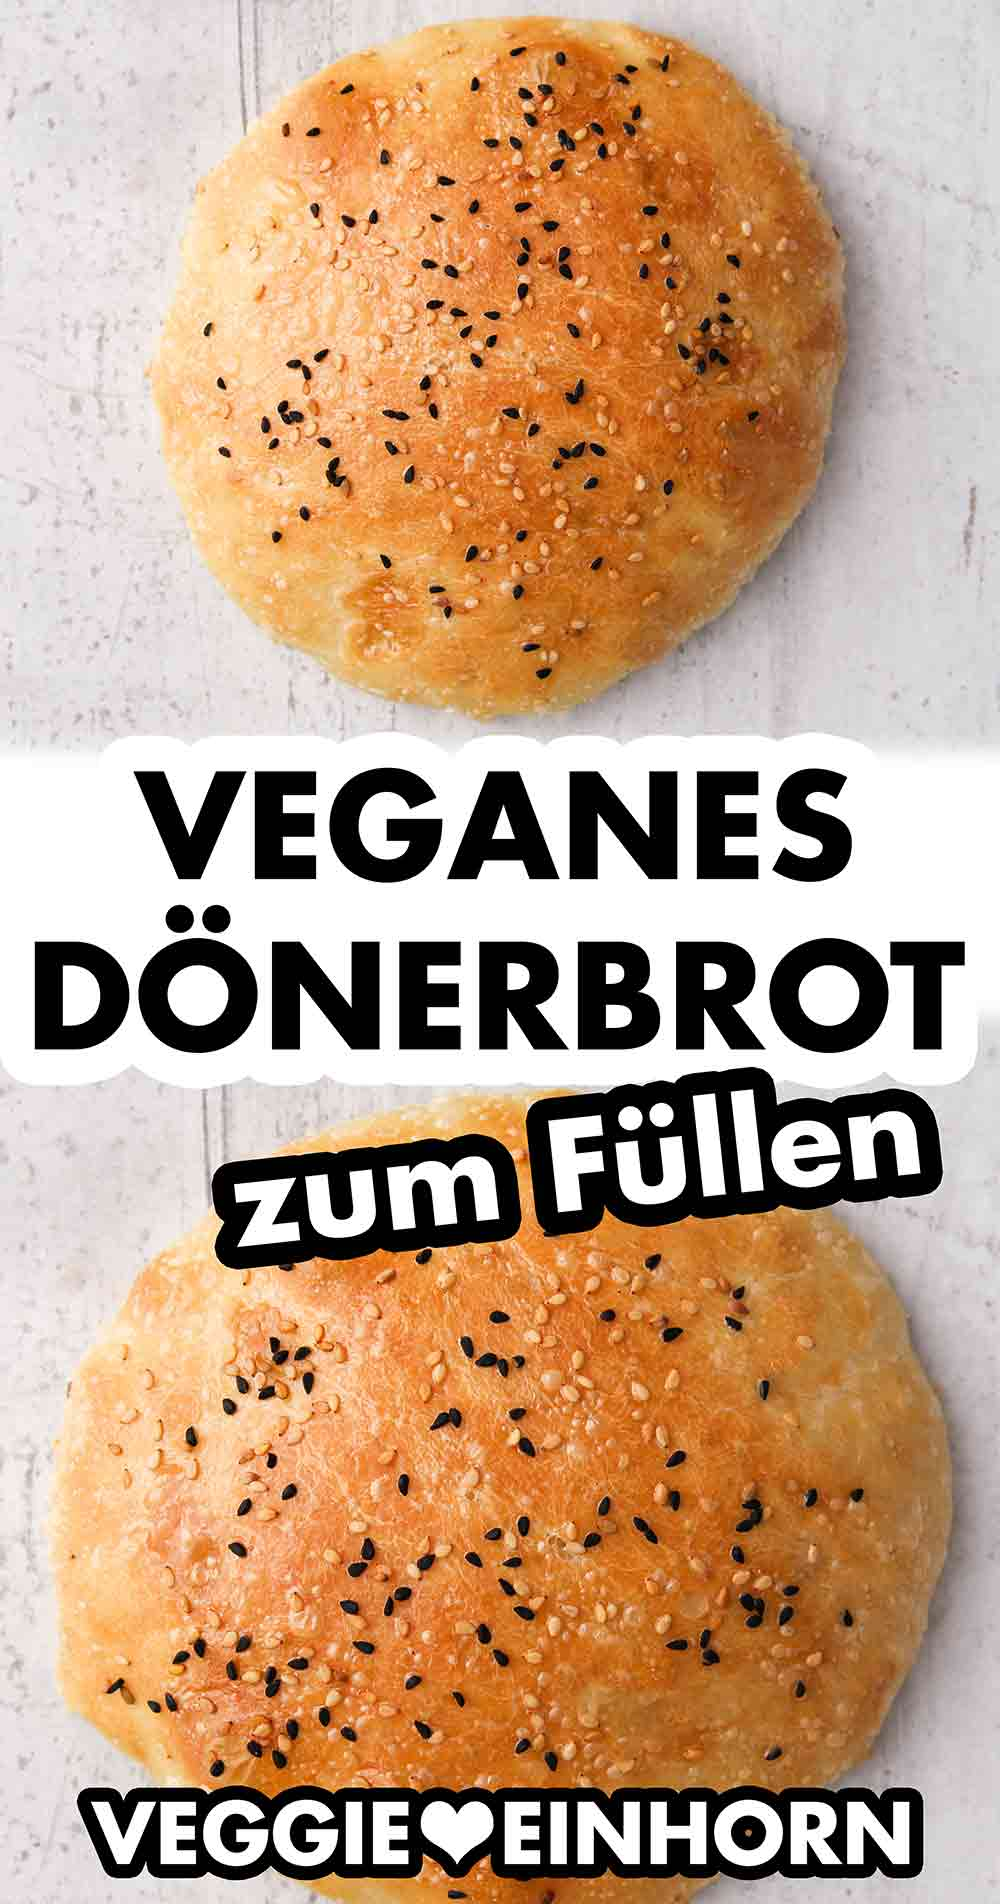 Veganes Dönerbrot